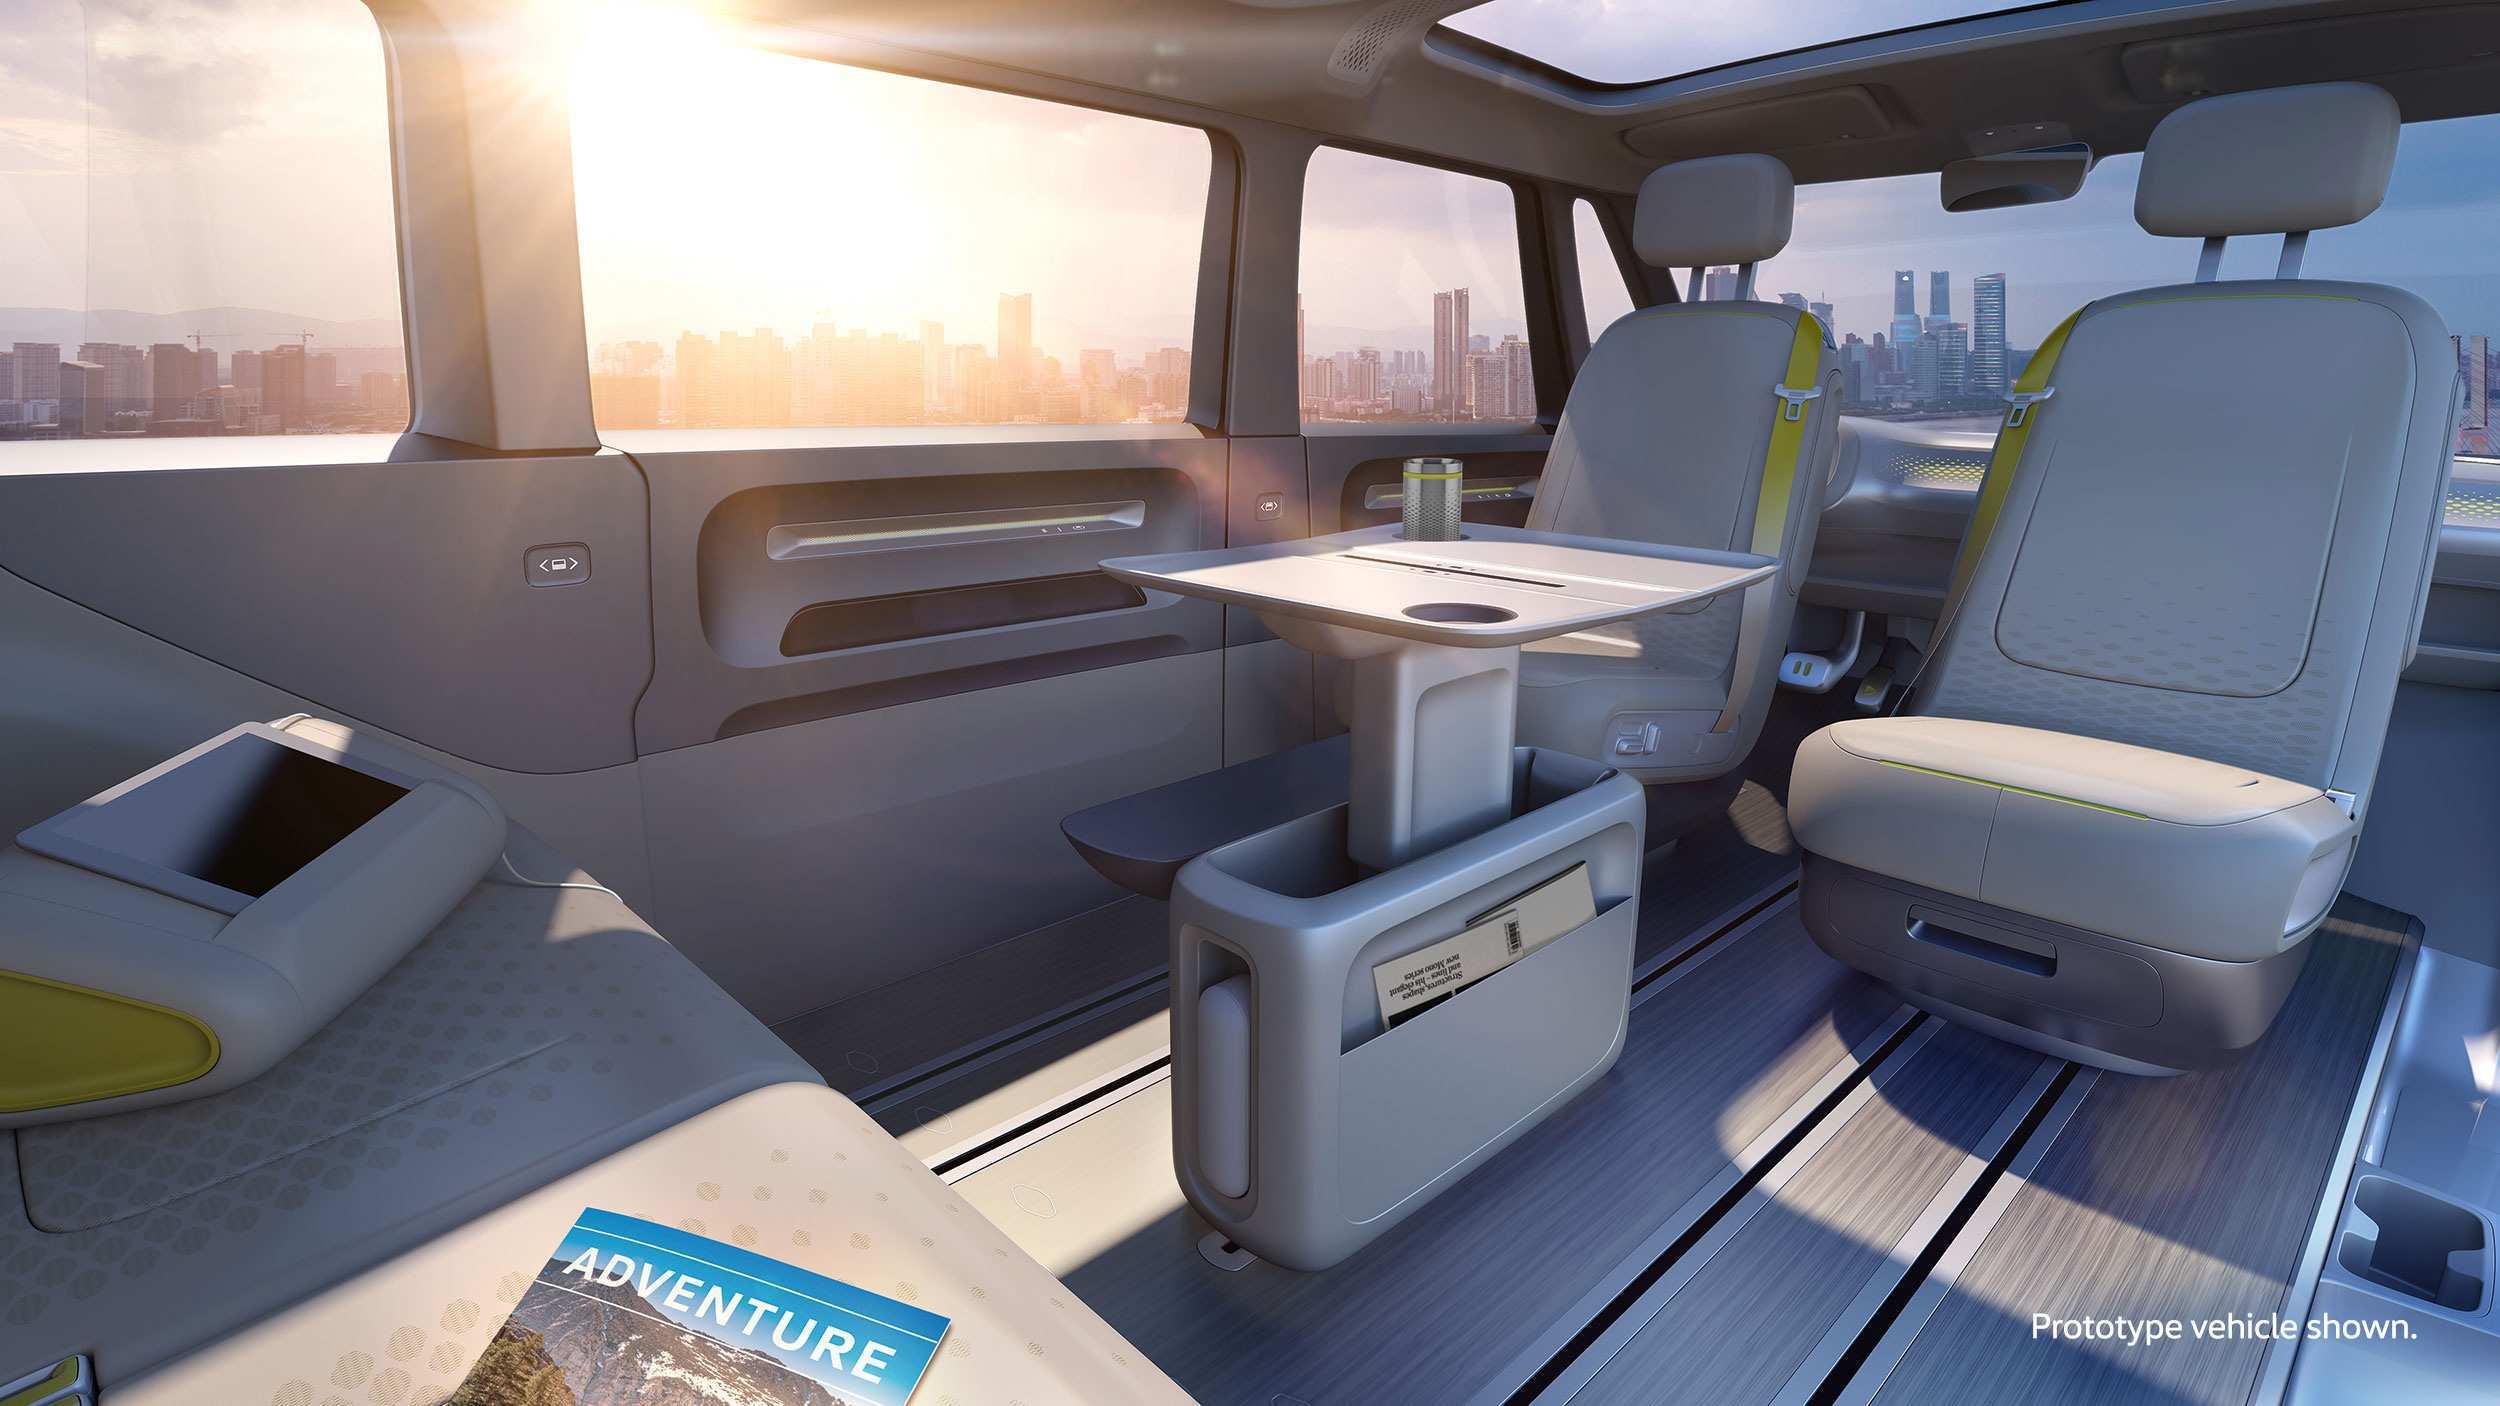 52 All New Volkswagen Vanagon 2020 Performance and New Engine by Volkswagen Vanagon 2020